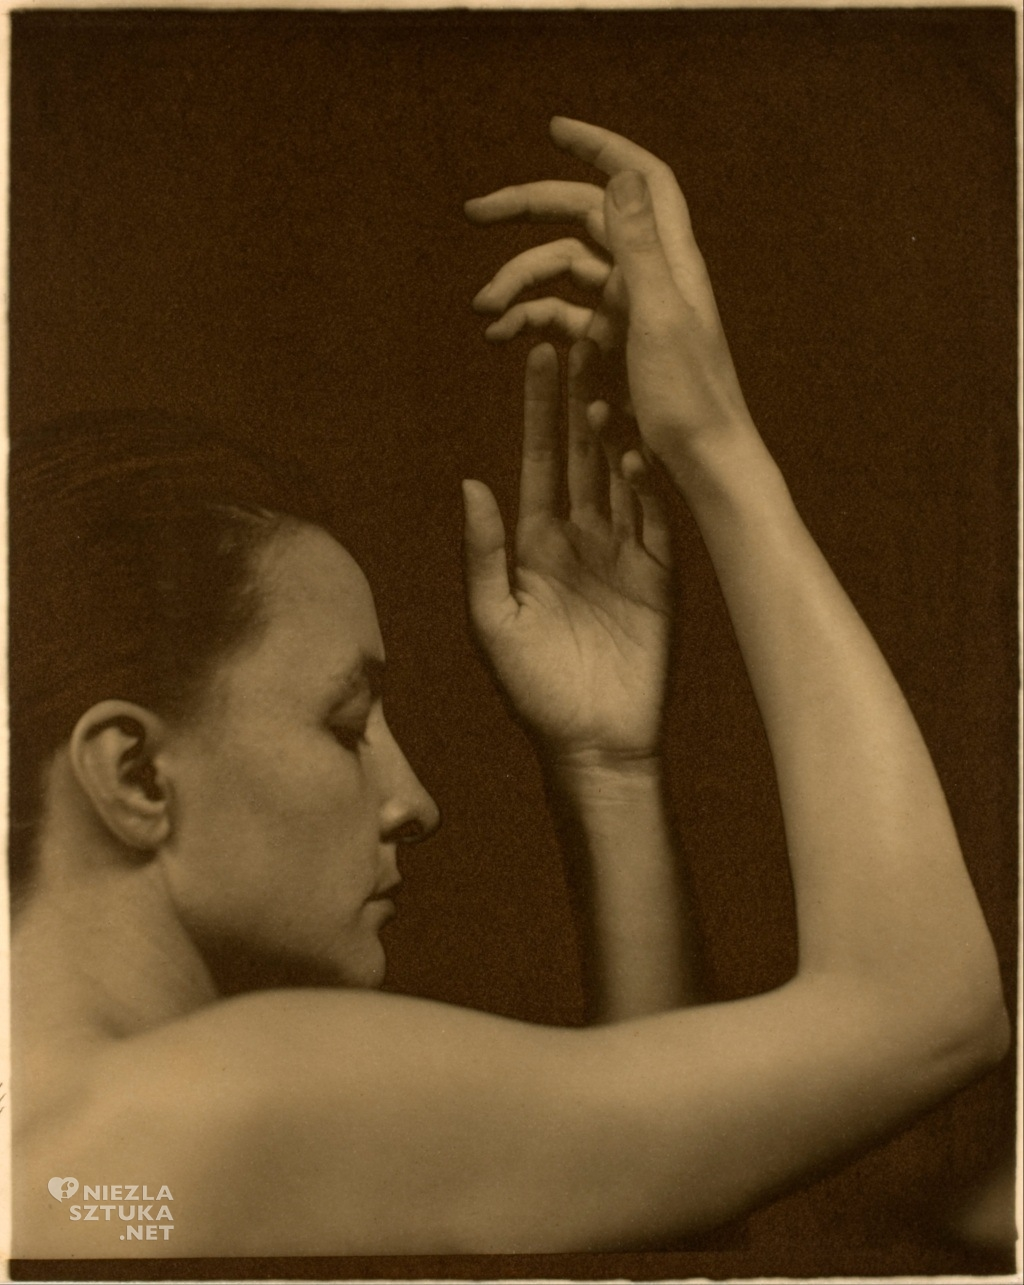 Alfred Stieglitz, Georgia O'Keeffe | 1920, fot.: wikipedia.org